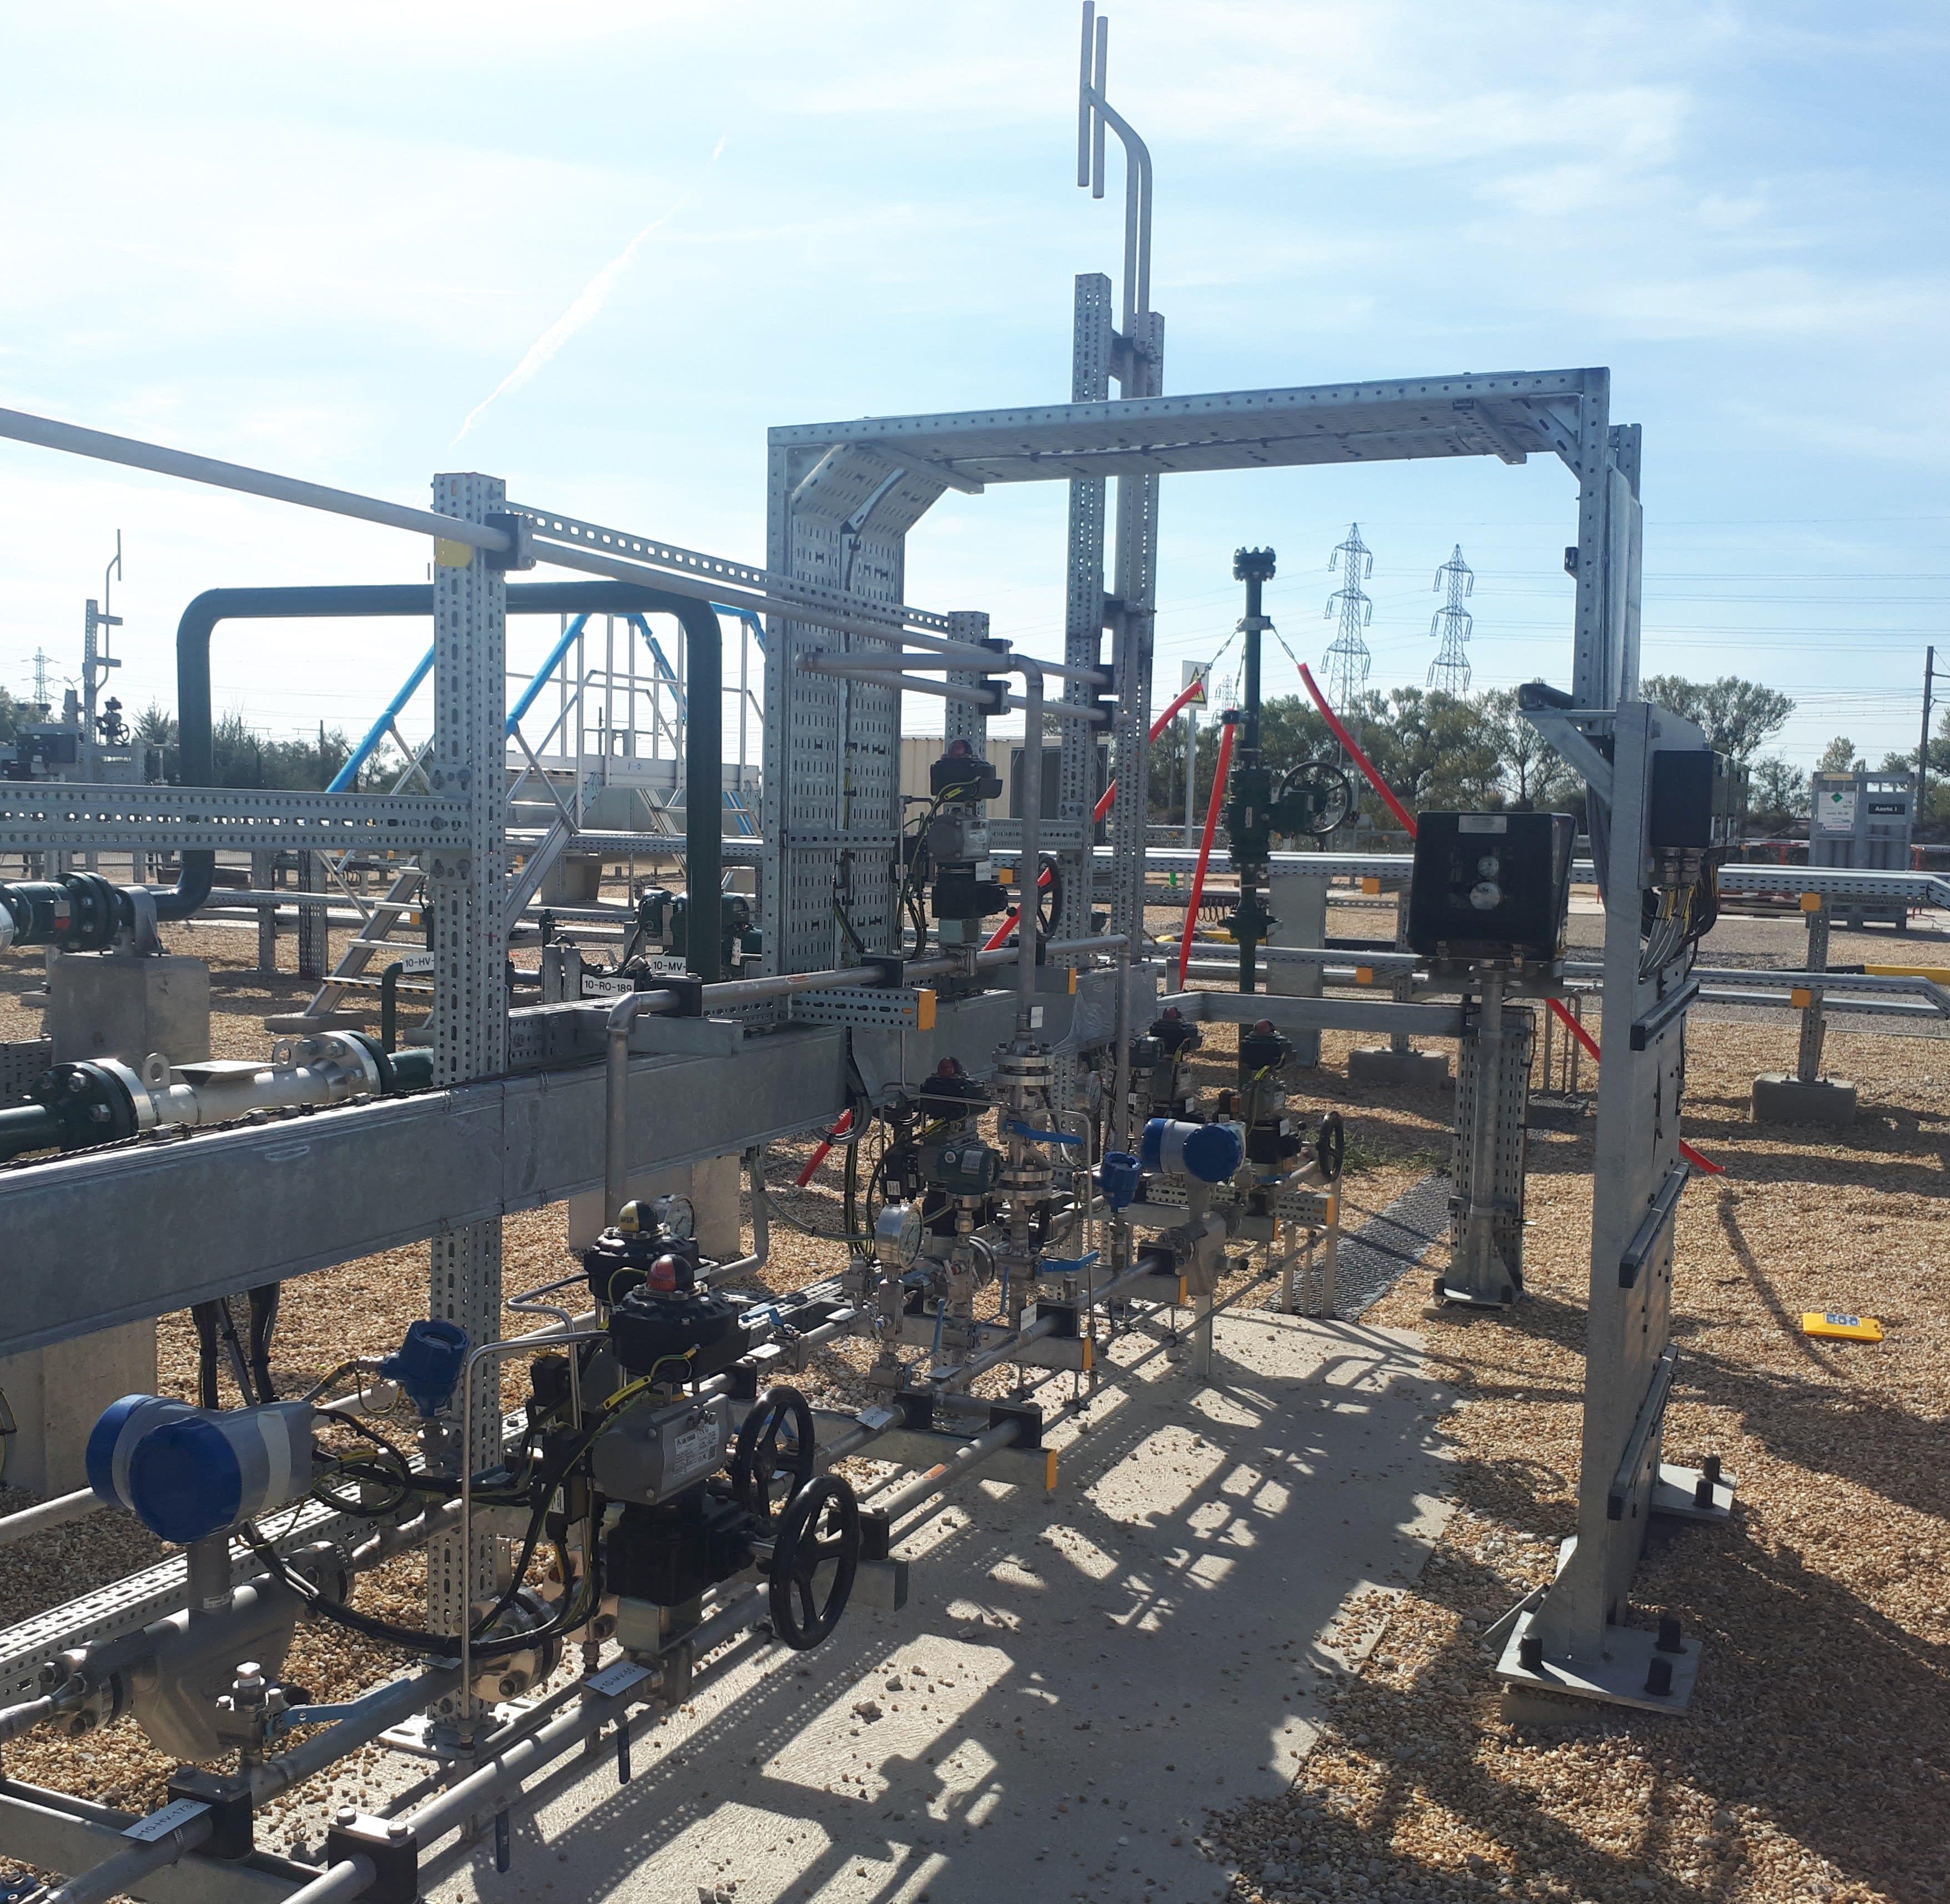 KROHNE Coriolis mass flowmeters installed at P2G demonstrator